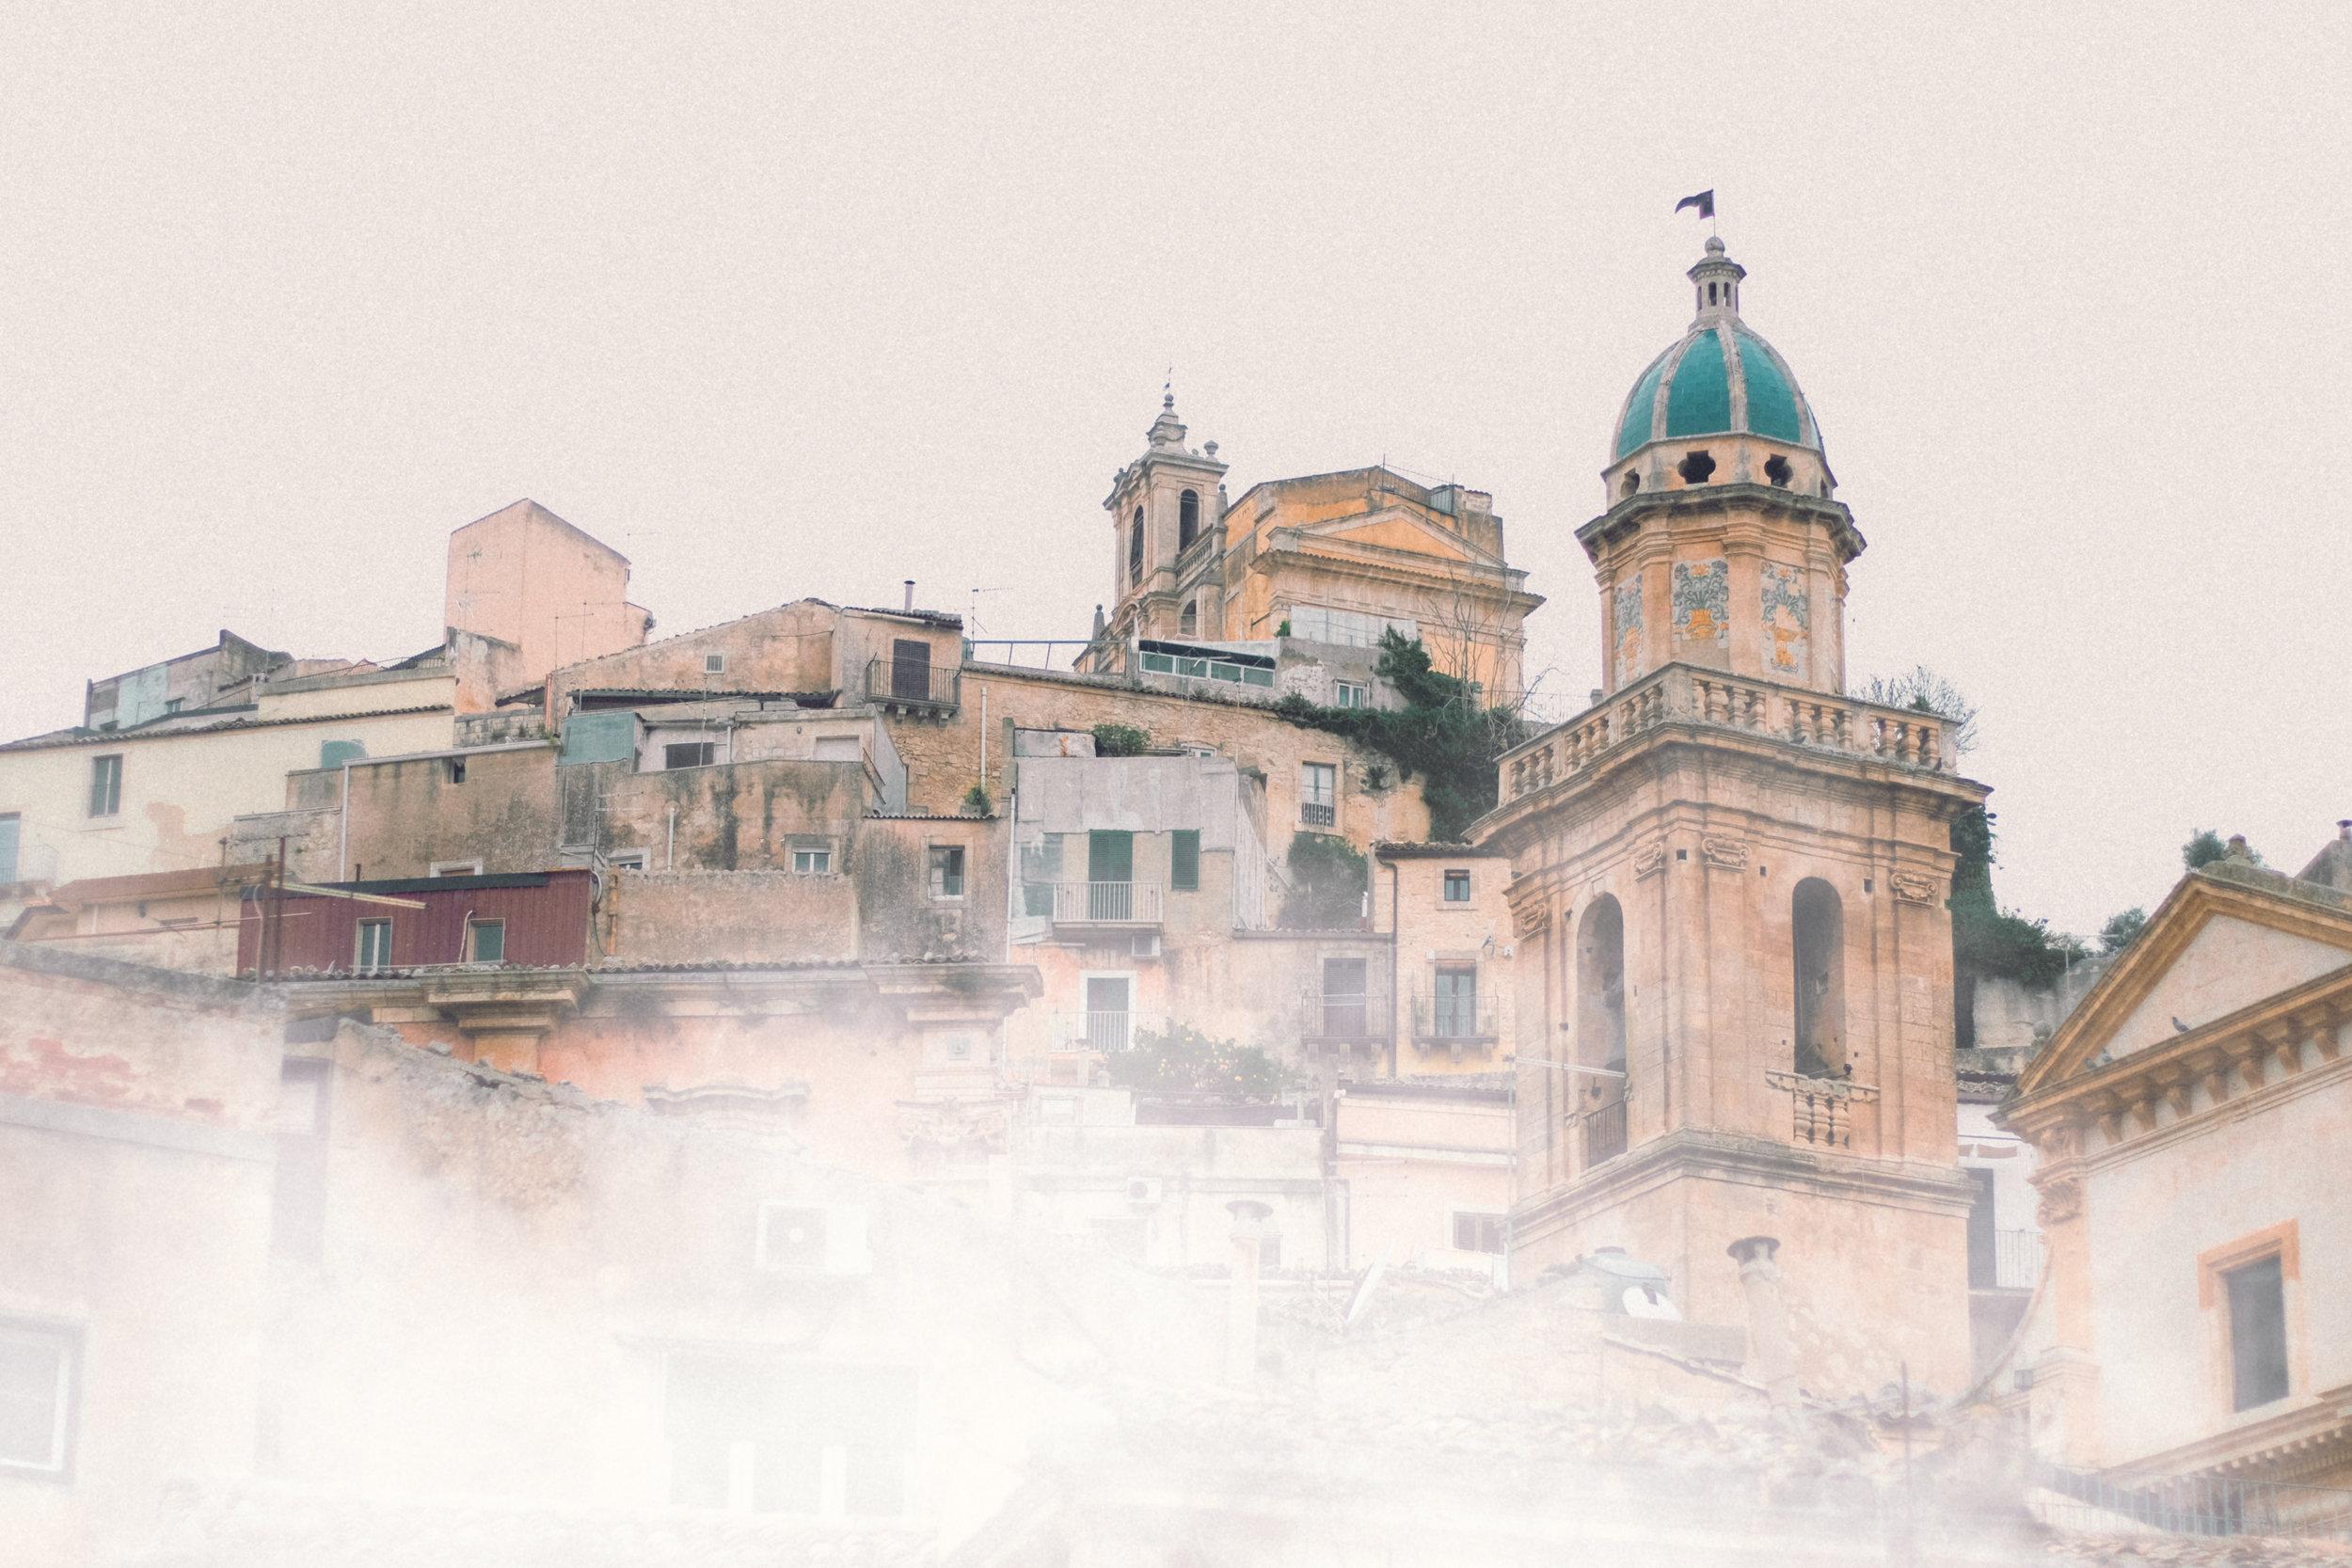 Sicily - Italy - Blalblablabla...